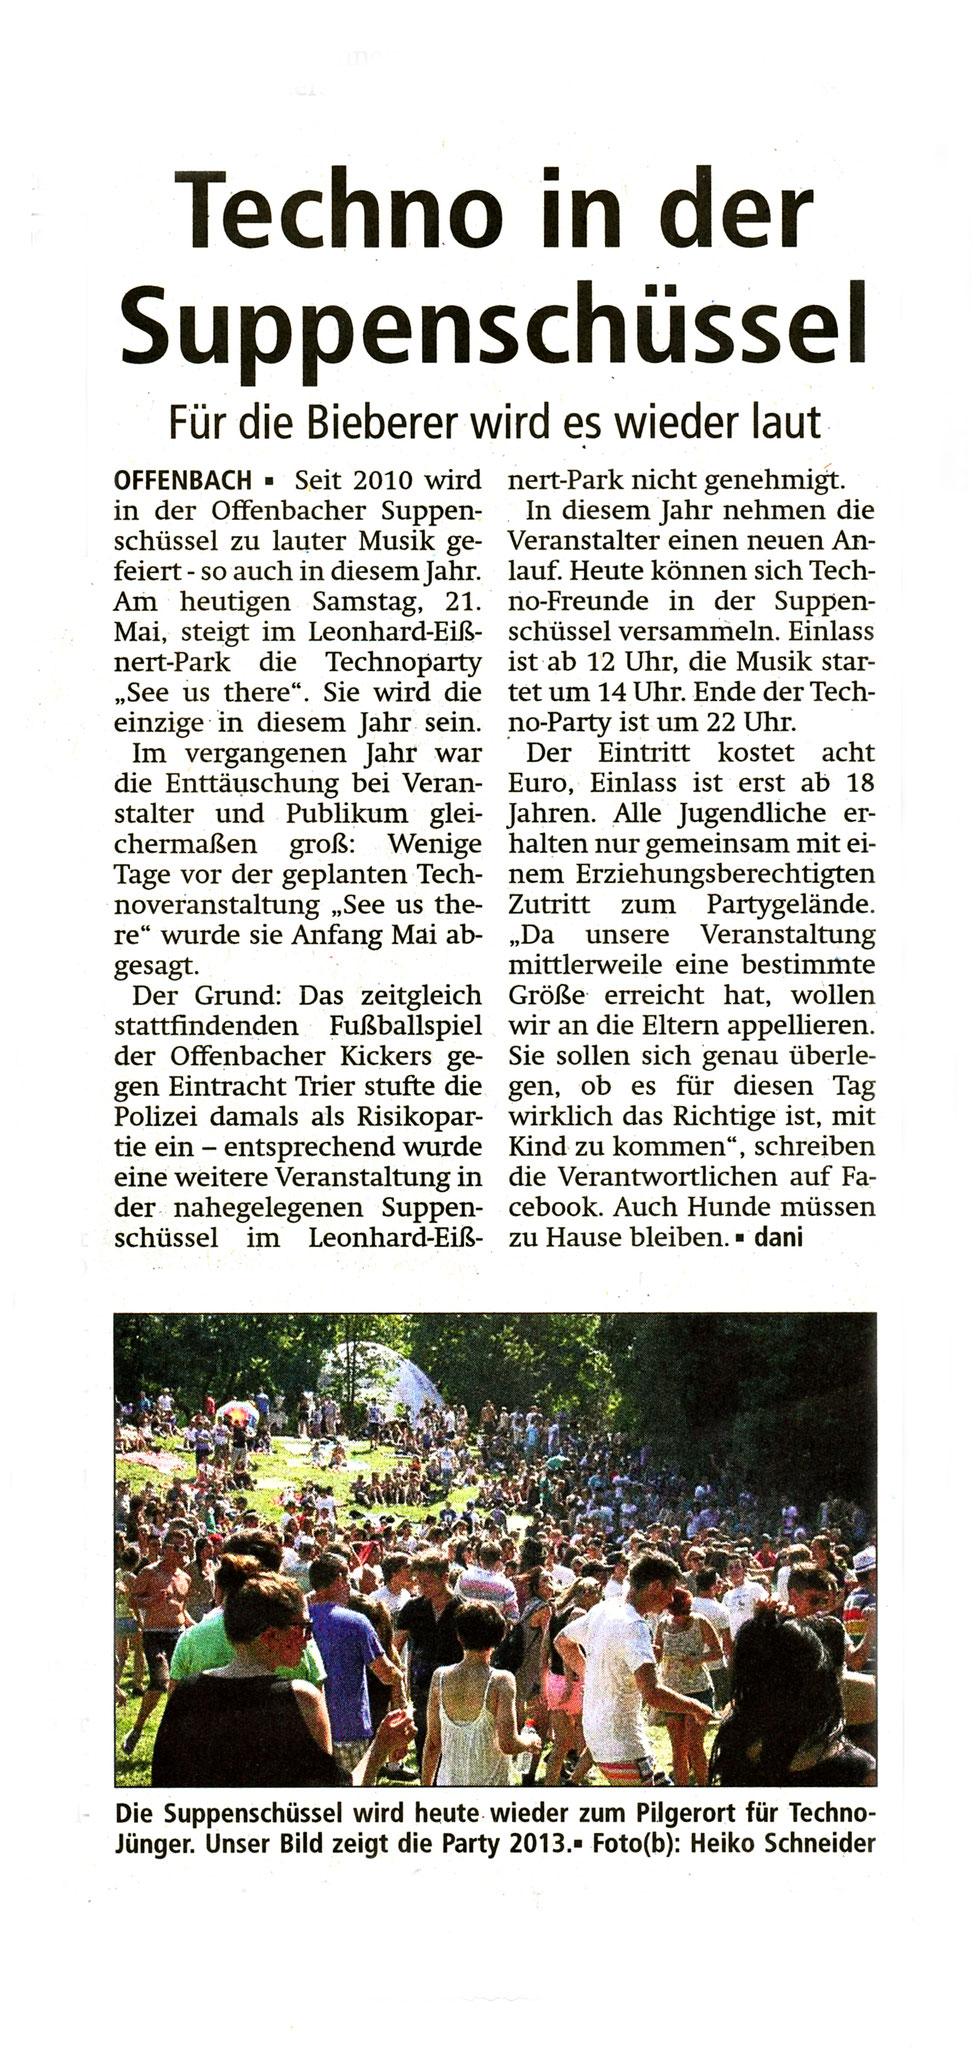 Offenbach Post, 21. Mai 2016